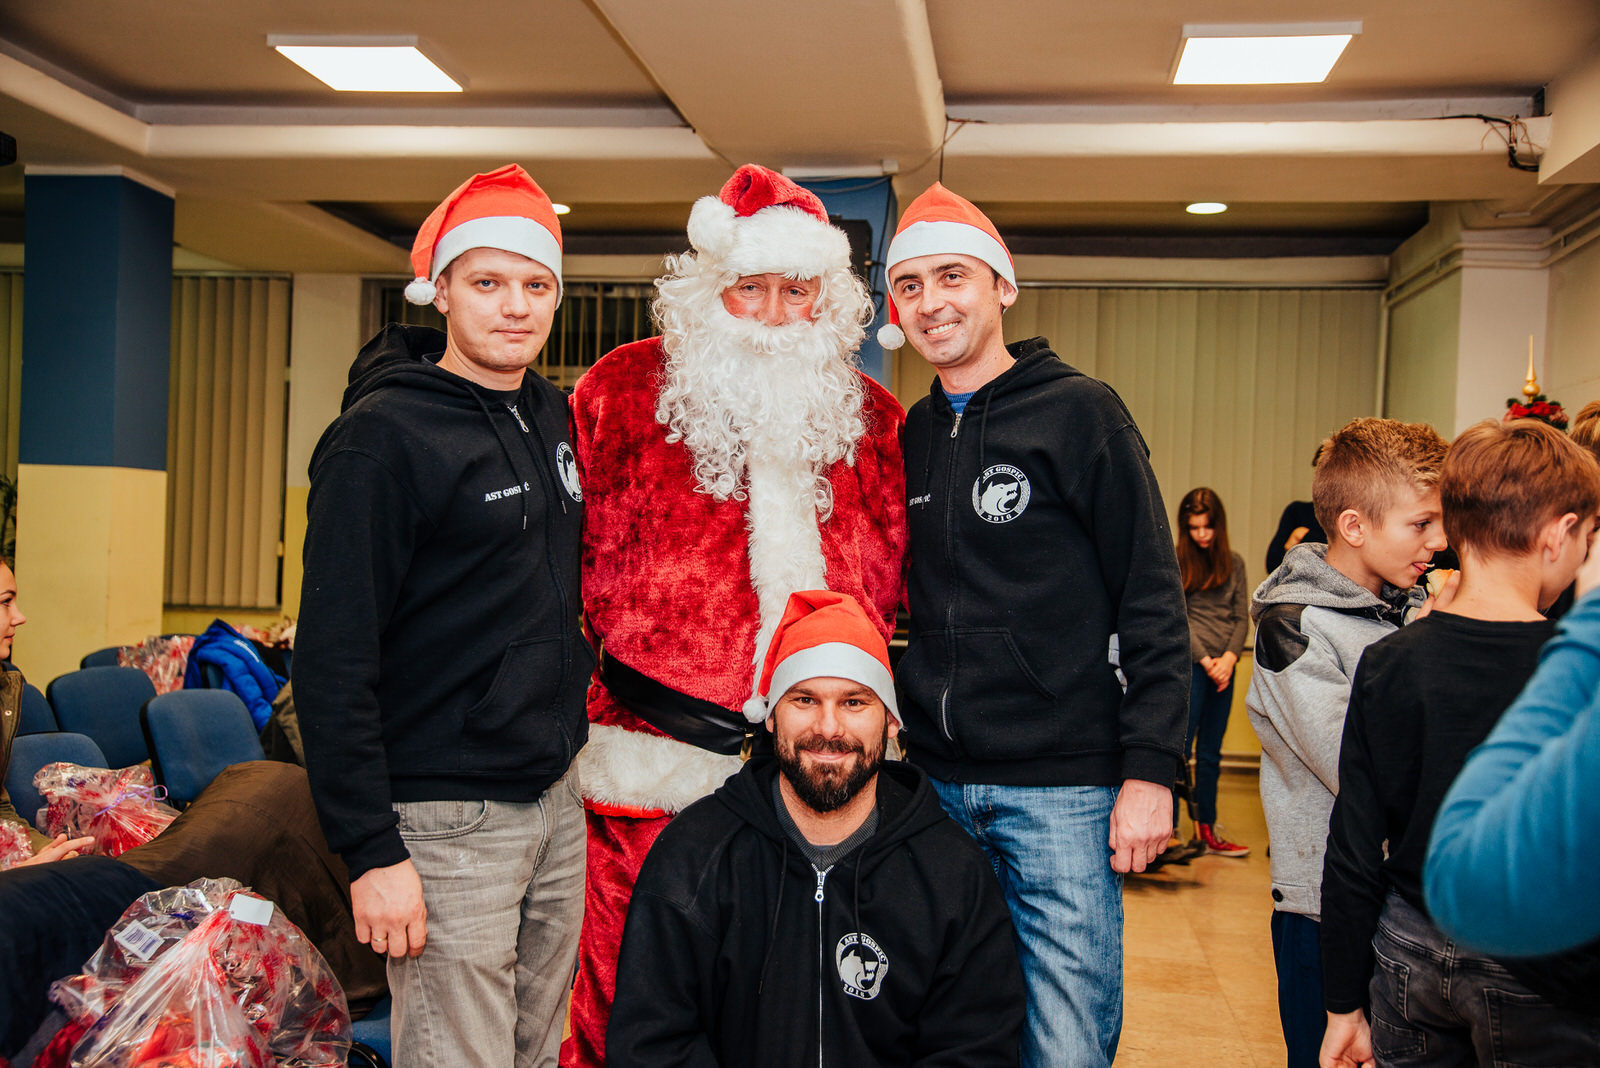 likaclub_airsoft-team-gospić-i-udruga-pčelice_2019-51